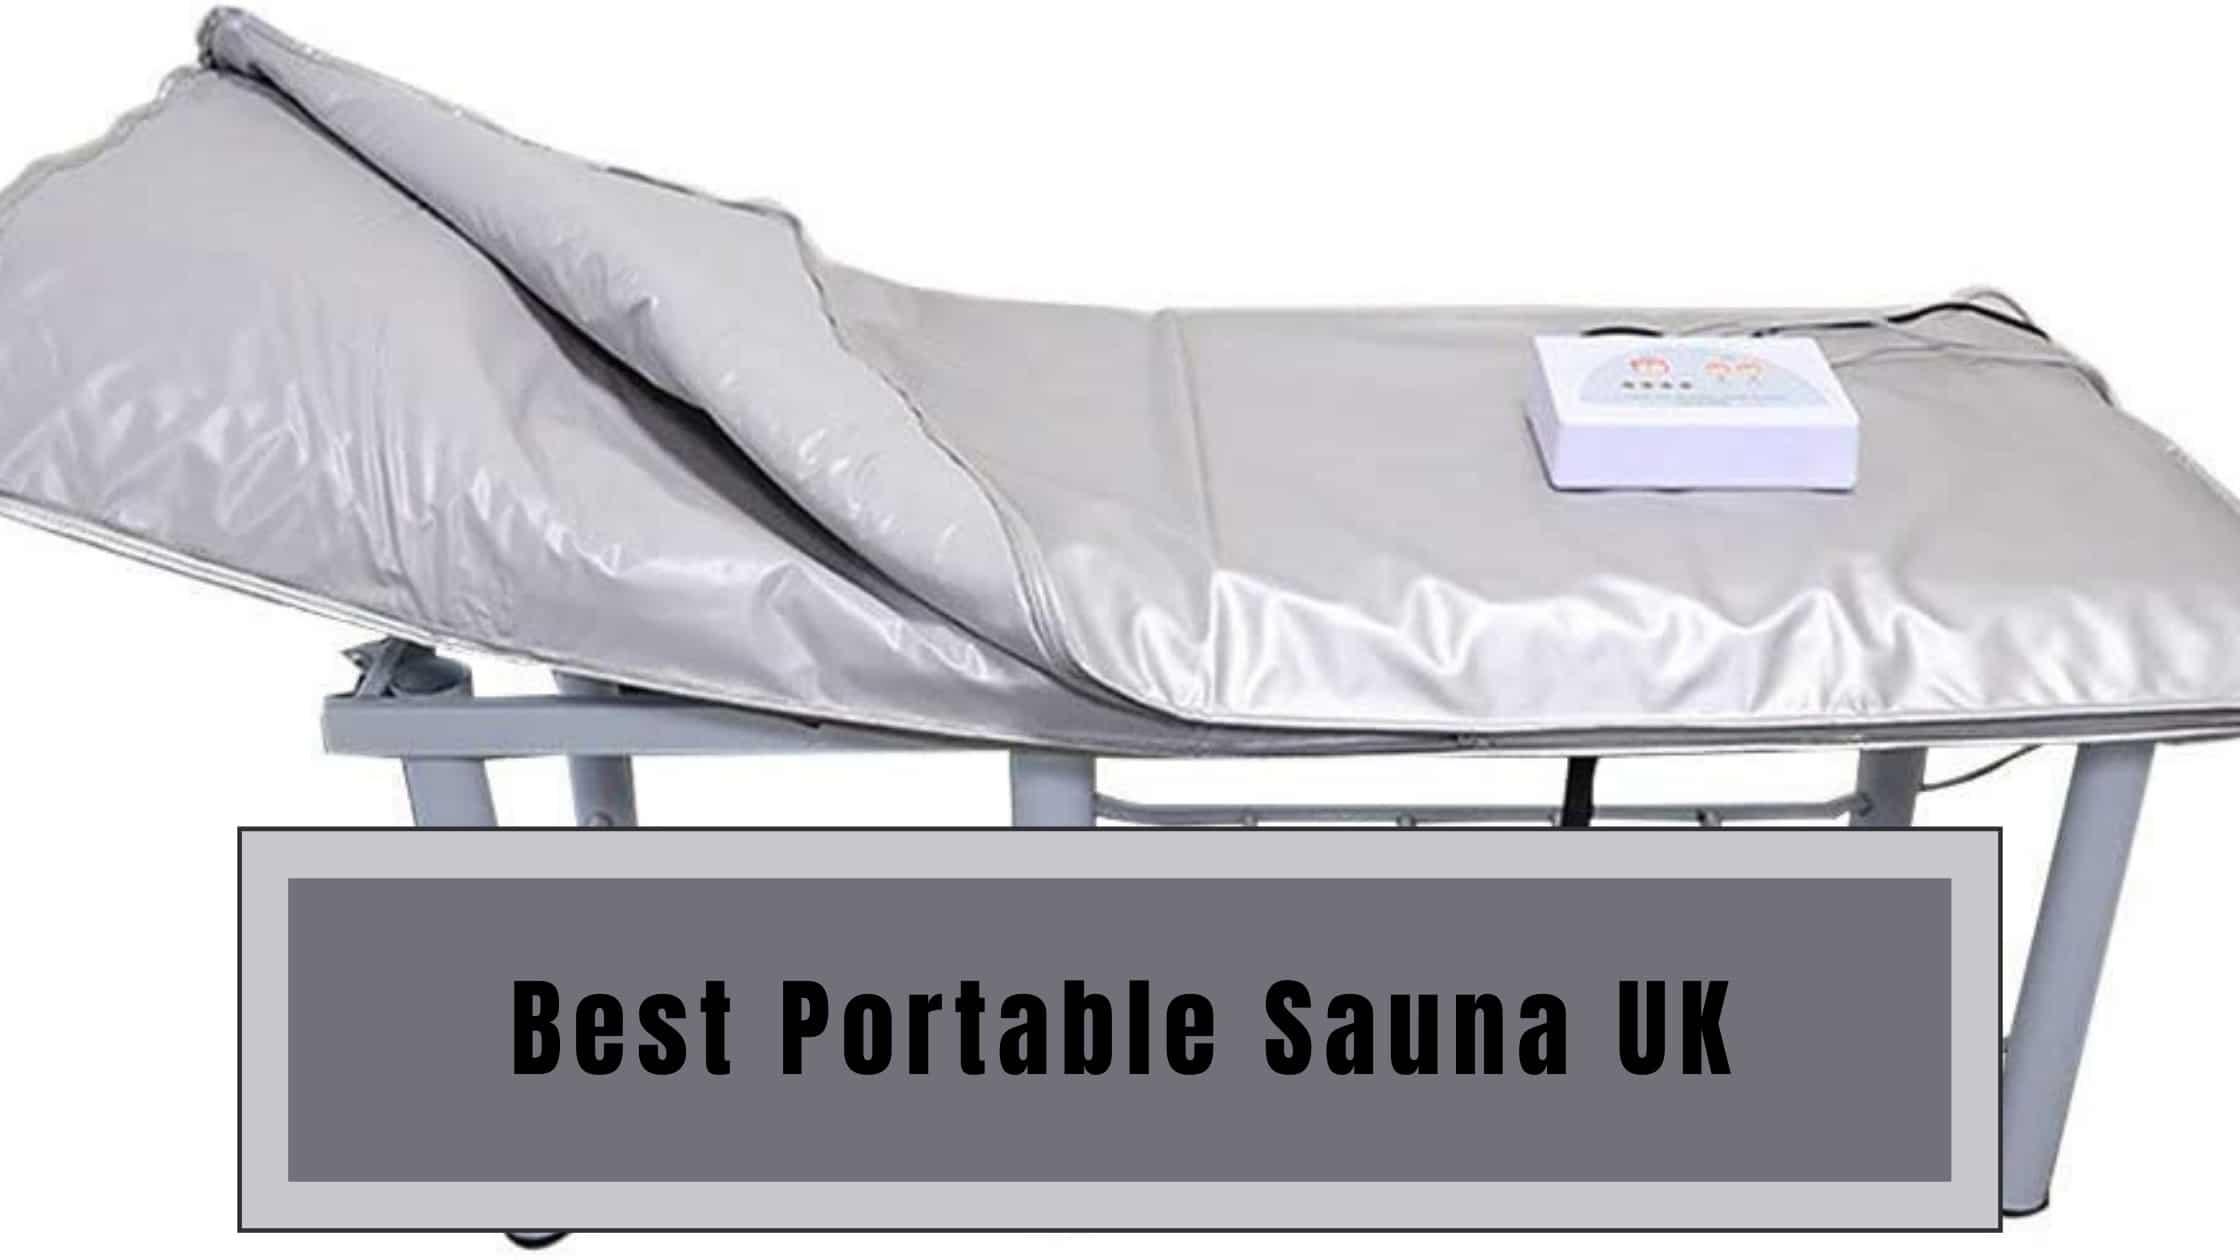 Best Portable Sauna UK